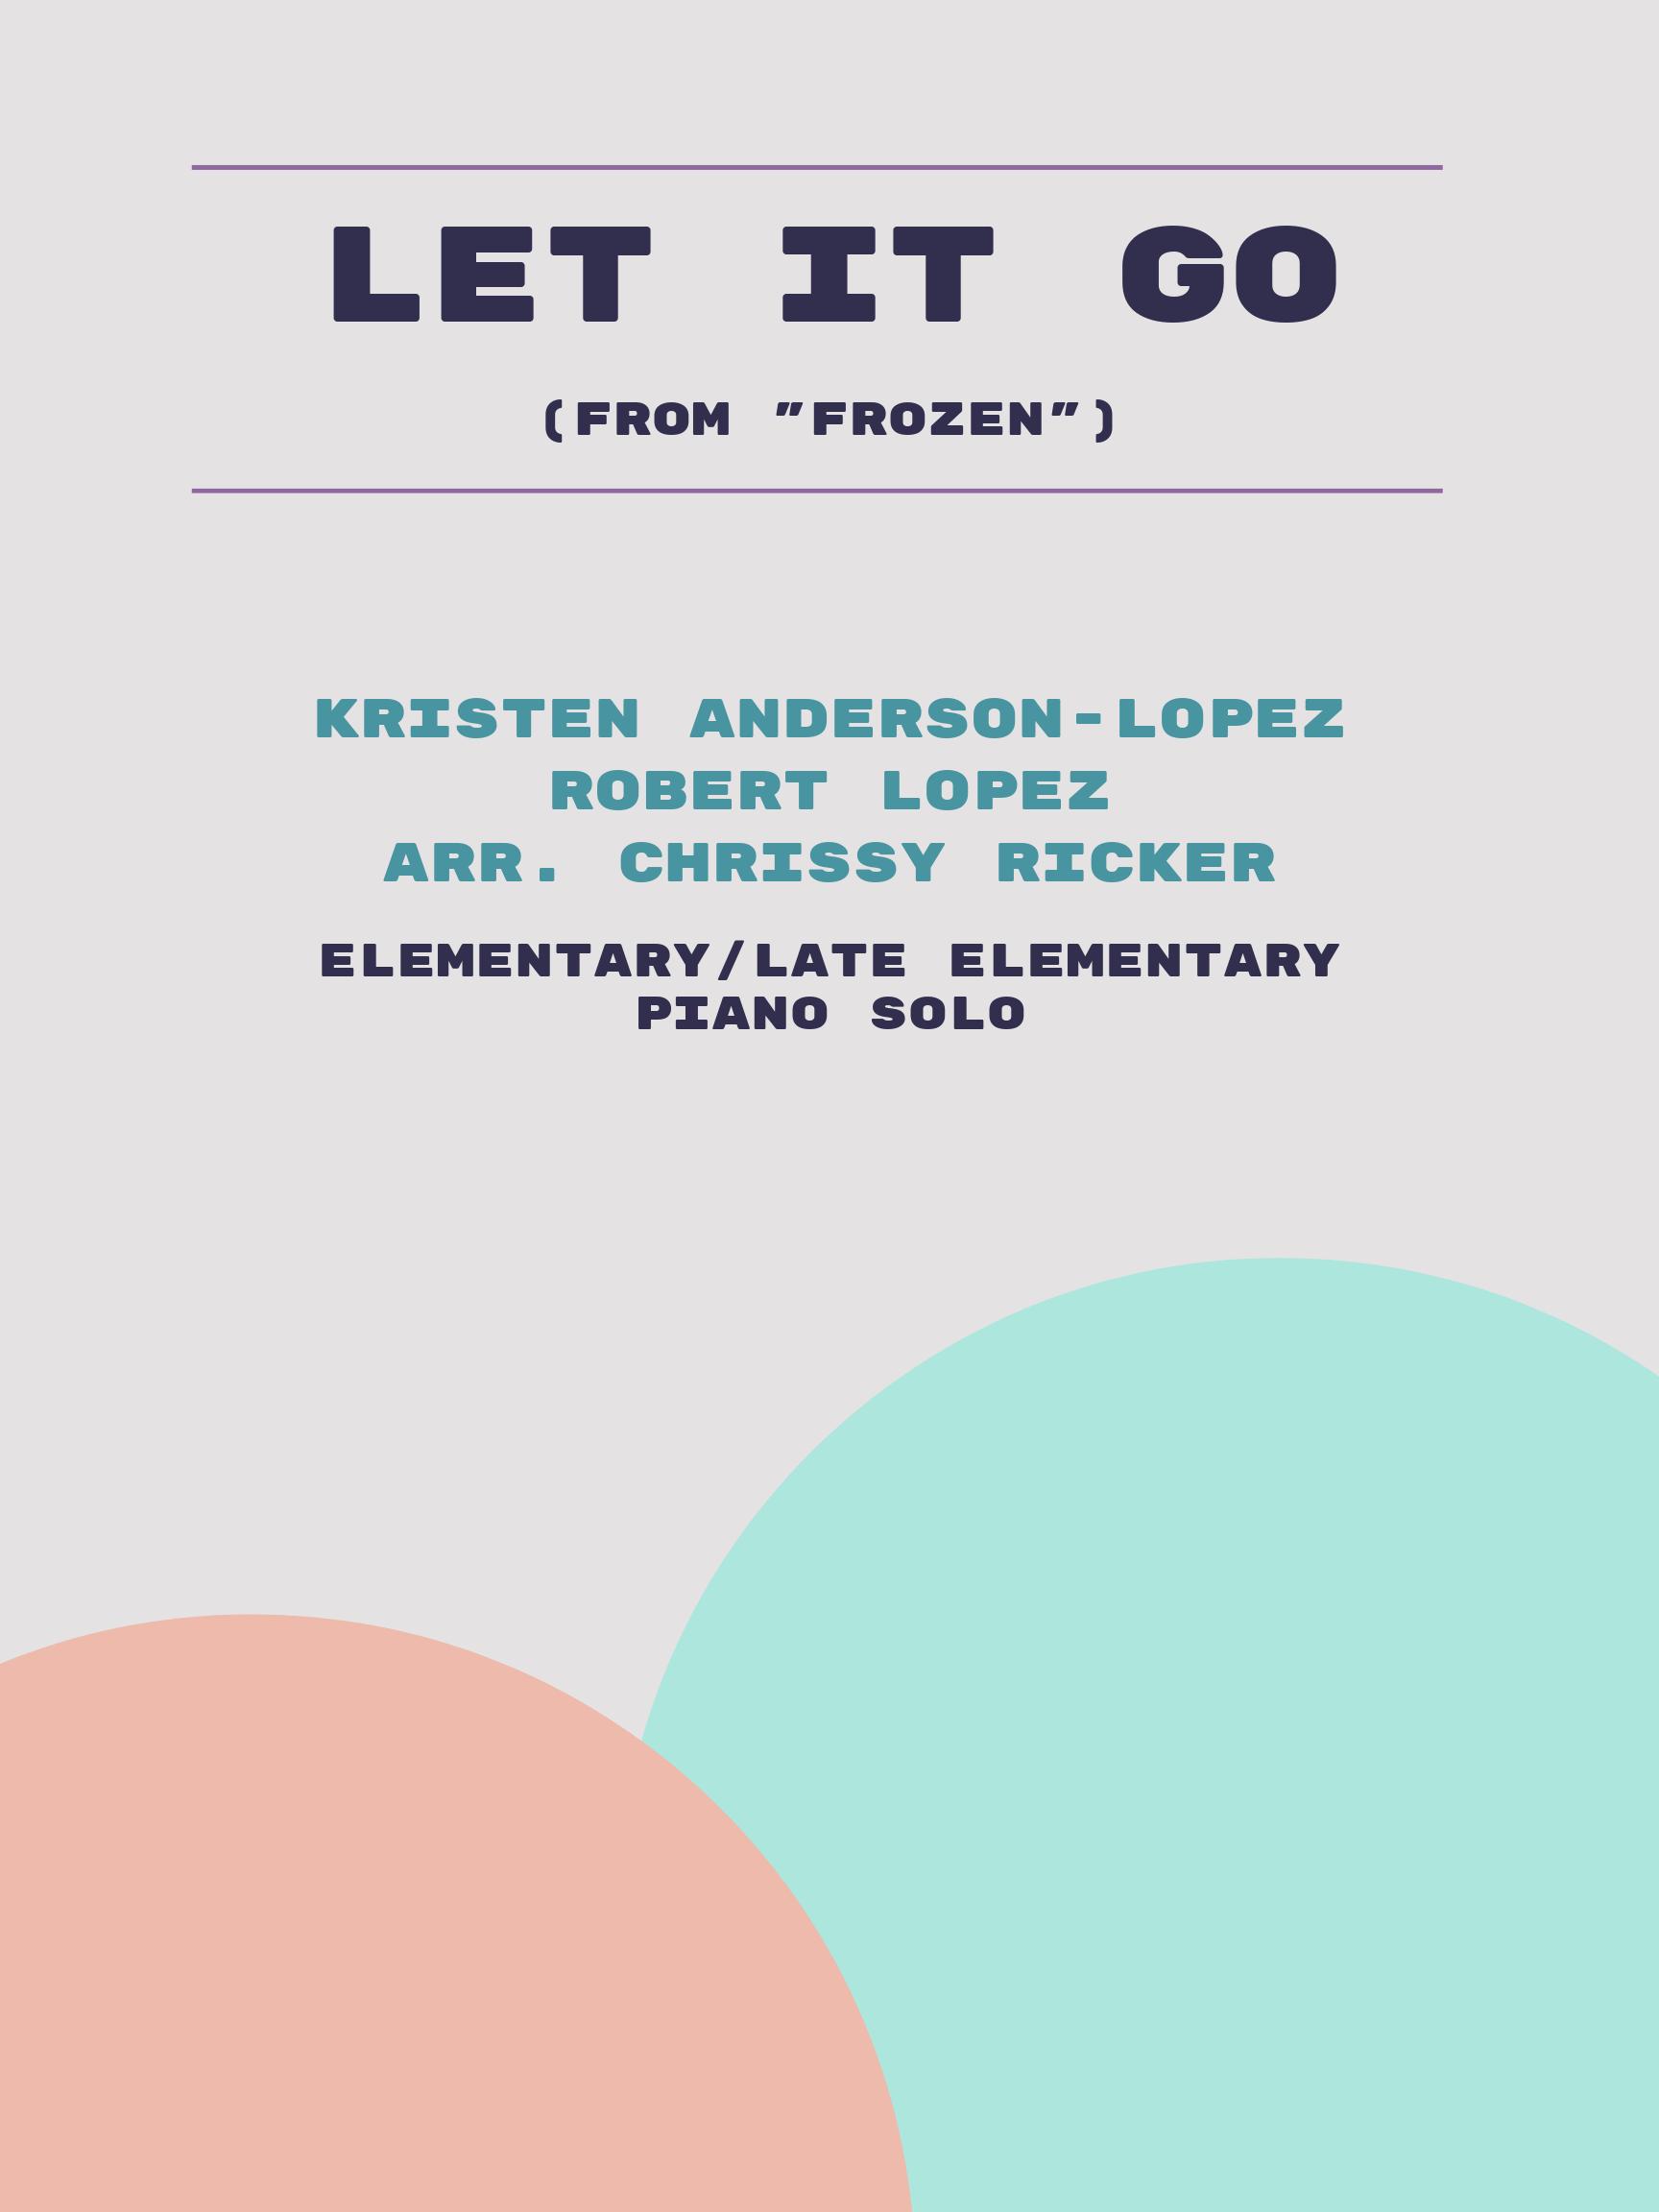 Let It Go by Kristen Anderson-Lopez, Robert Lopez